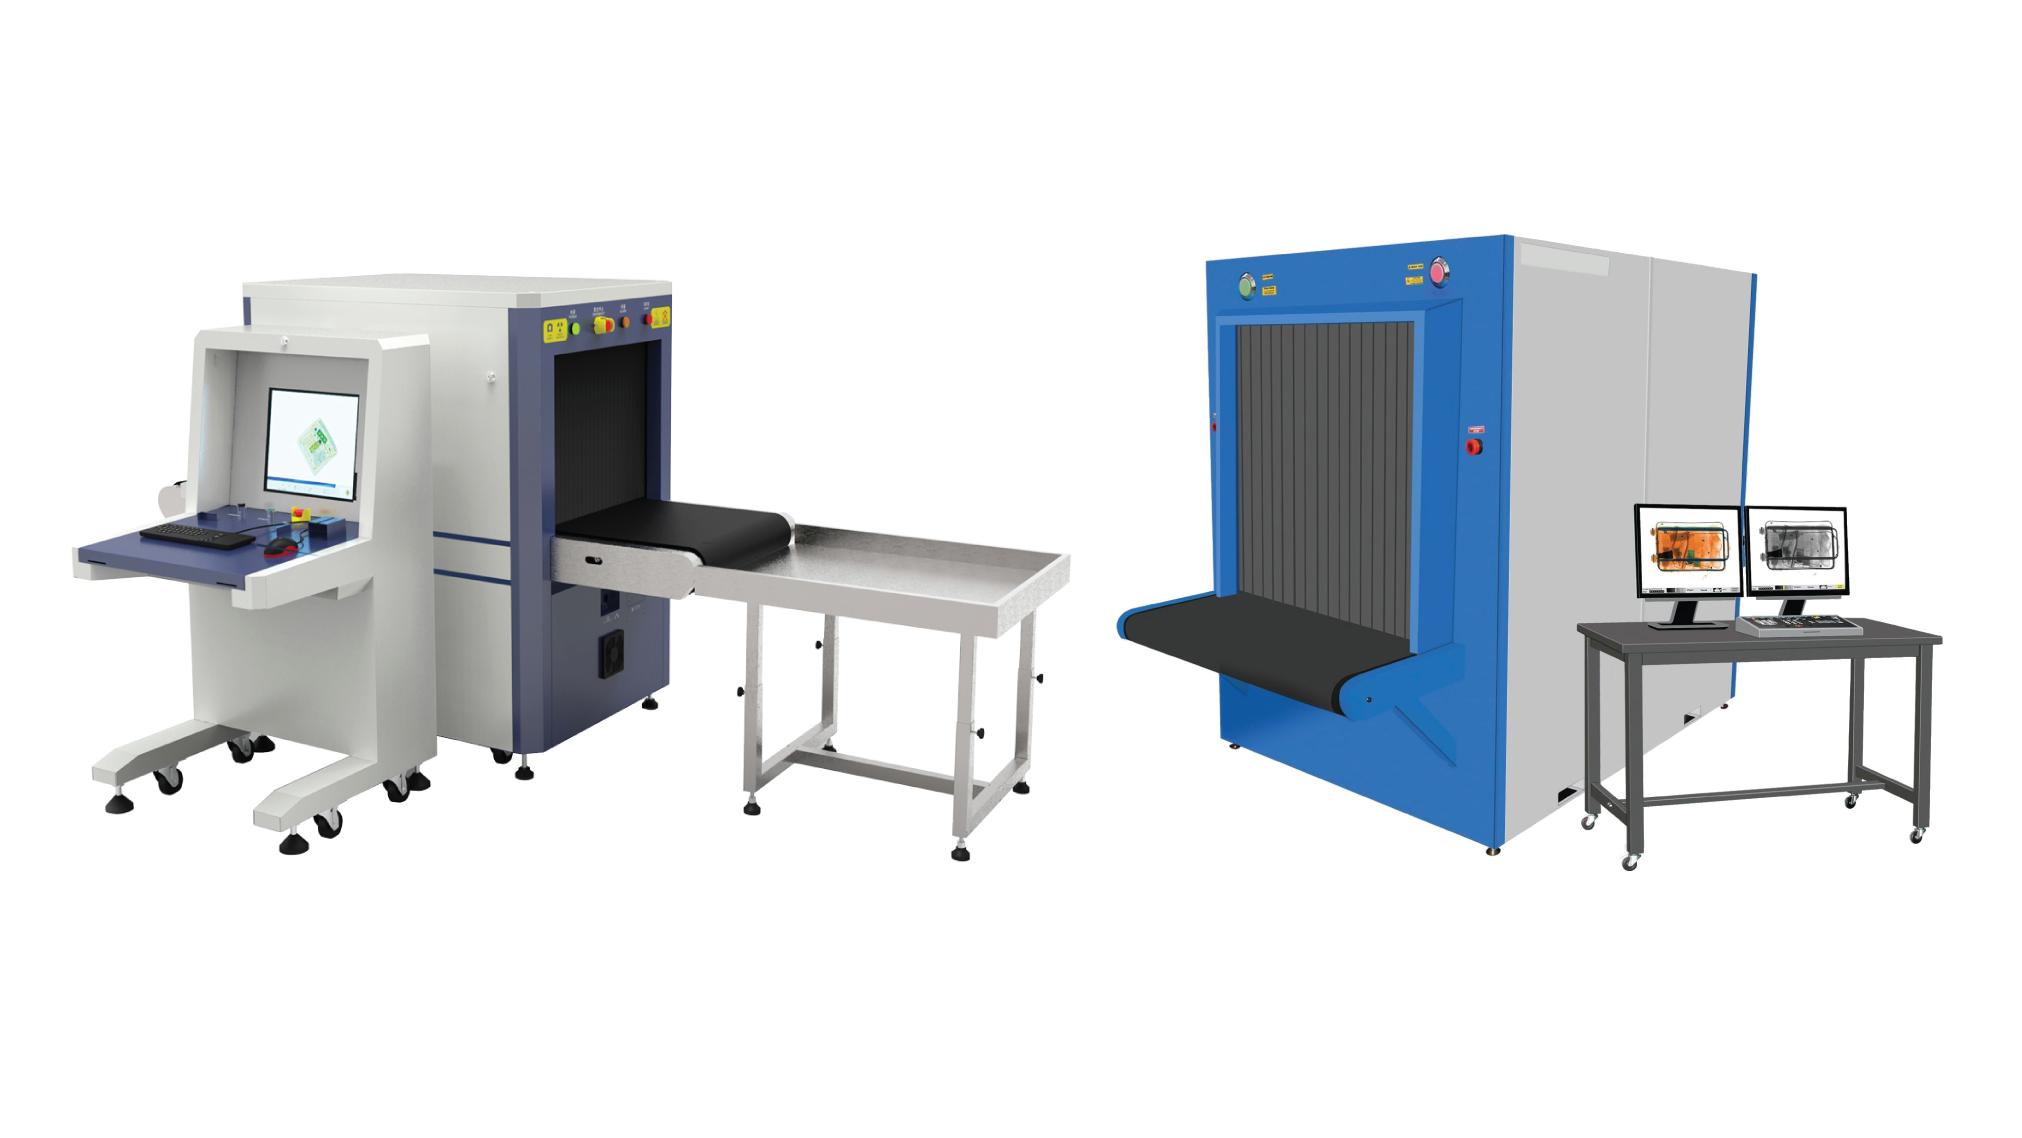 X Ray Luggage Baggage Scanner Machine In Bangladesh Call For Buy 01611 75 87 87 Email Nobaruninternational Gmail Com Lugg Luggage Baggage Baggage Luggage